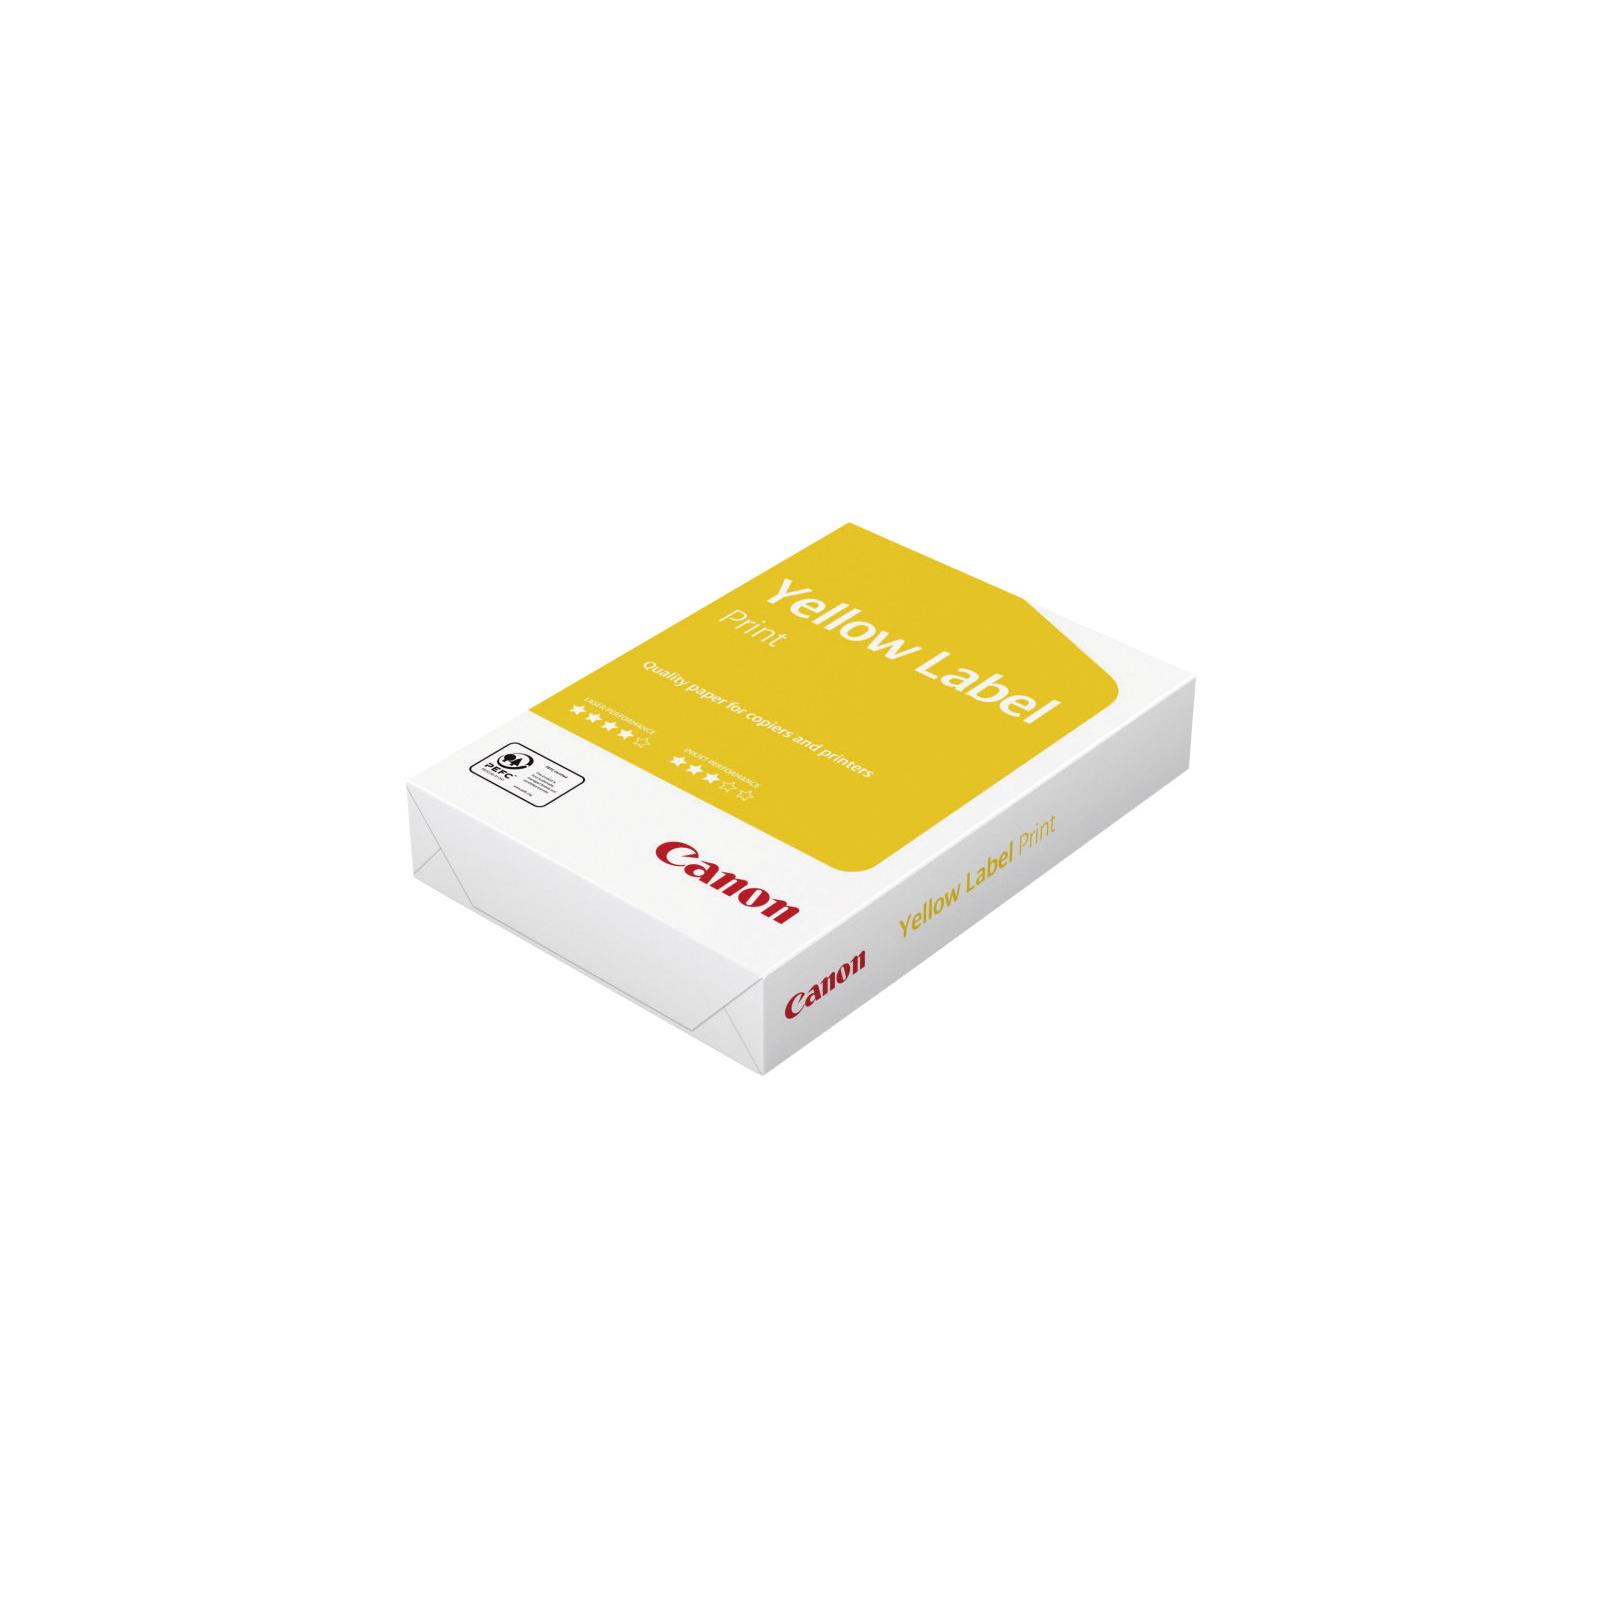 Бумага Canon A4 Yellow Label Print (6821B001/ 5897А022)